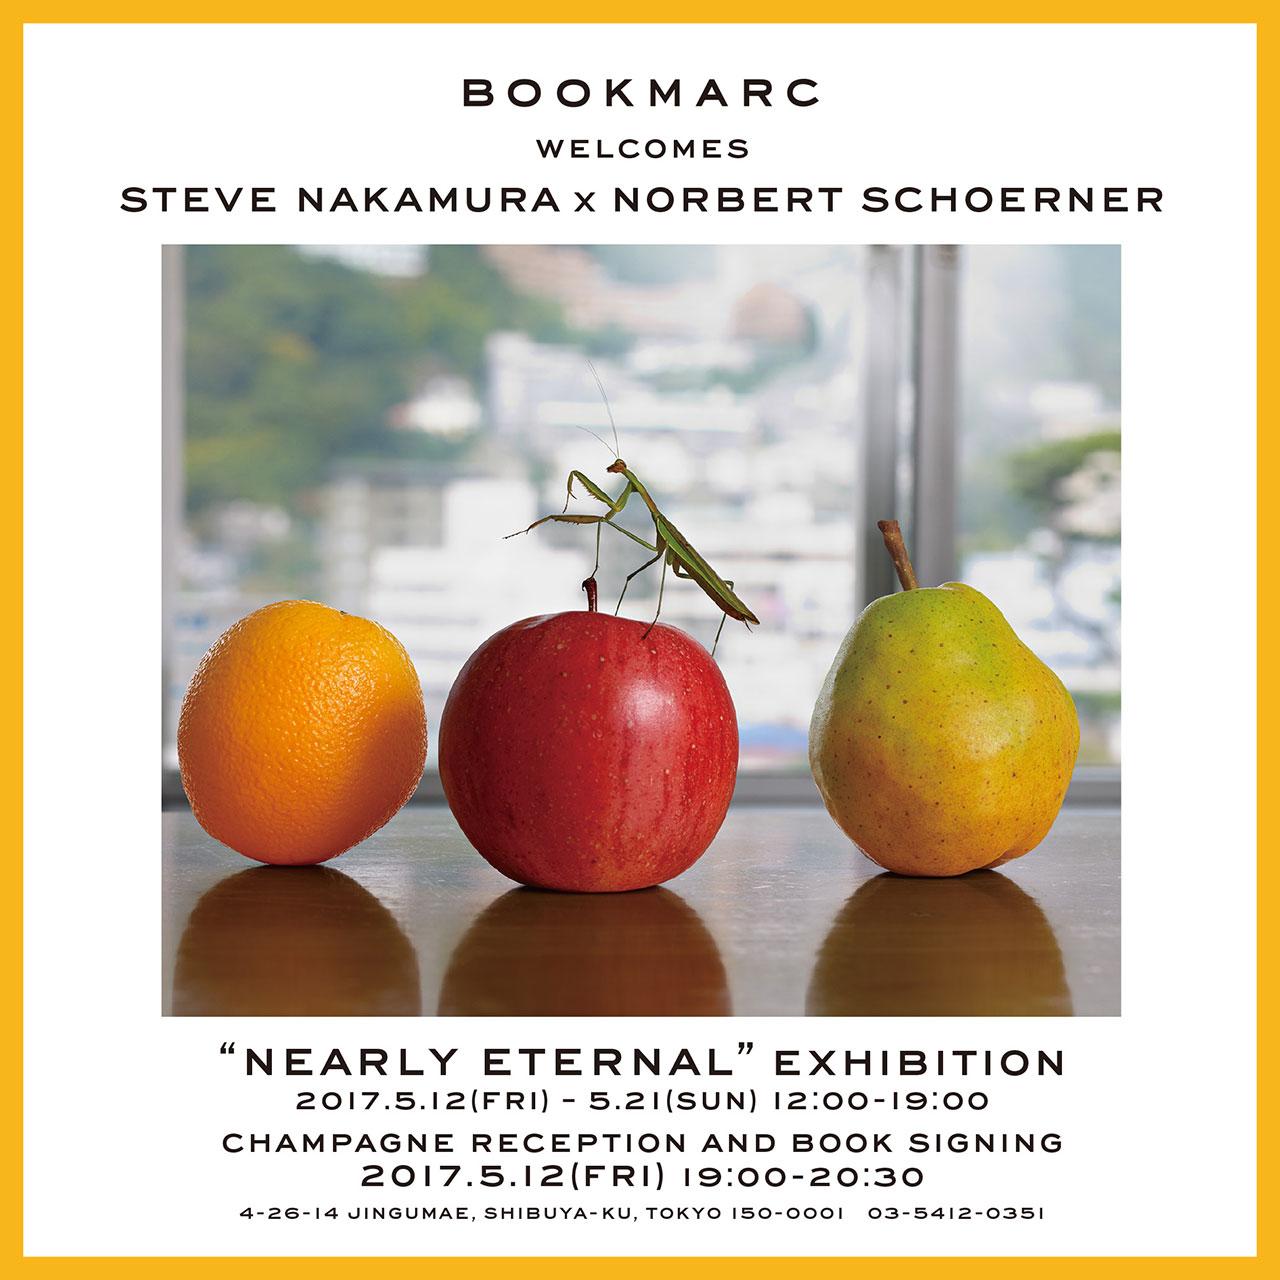 Steve Nakamura & Norbert Schoerner: NEARLY ETERNAL